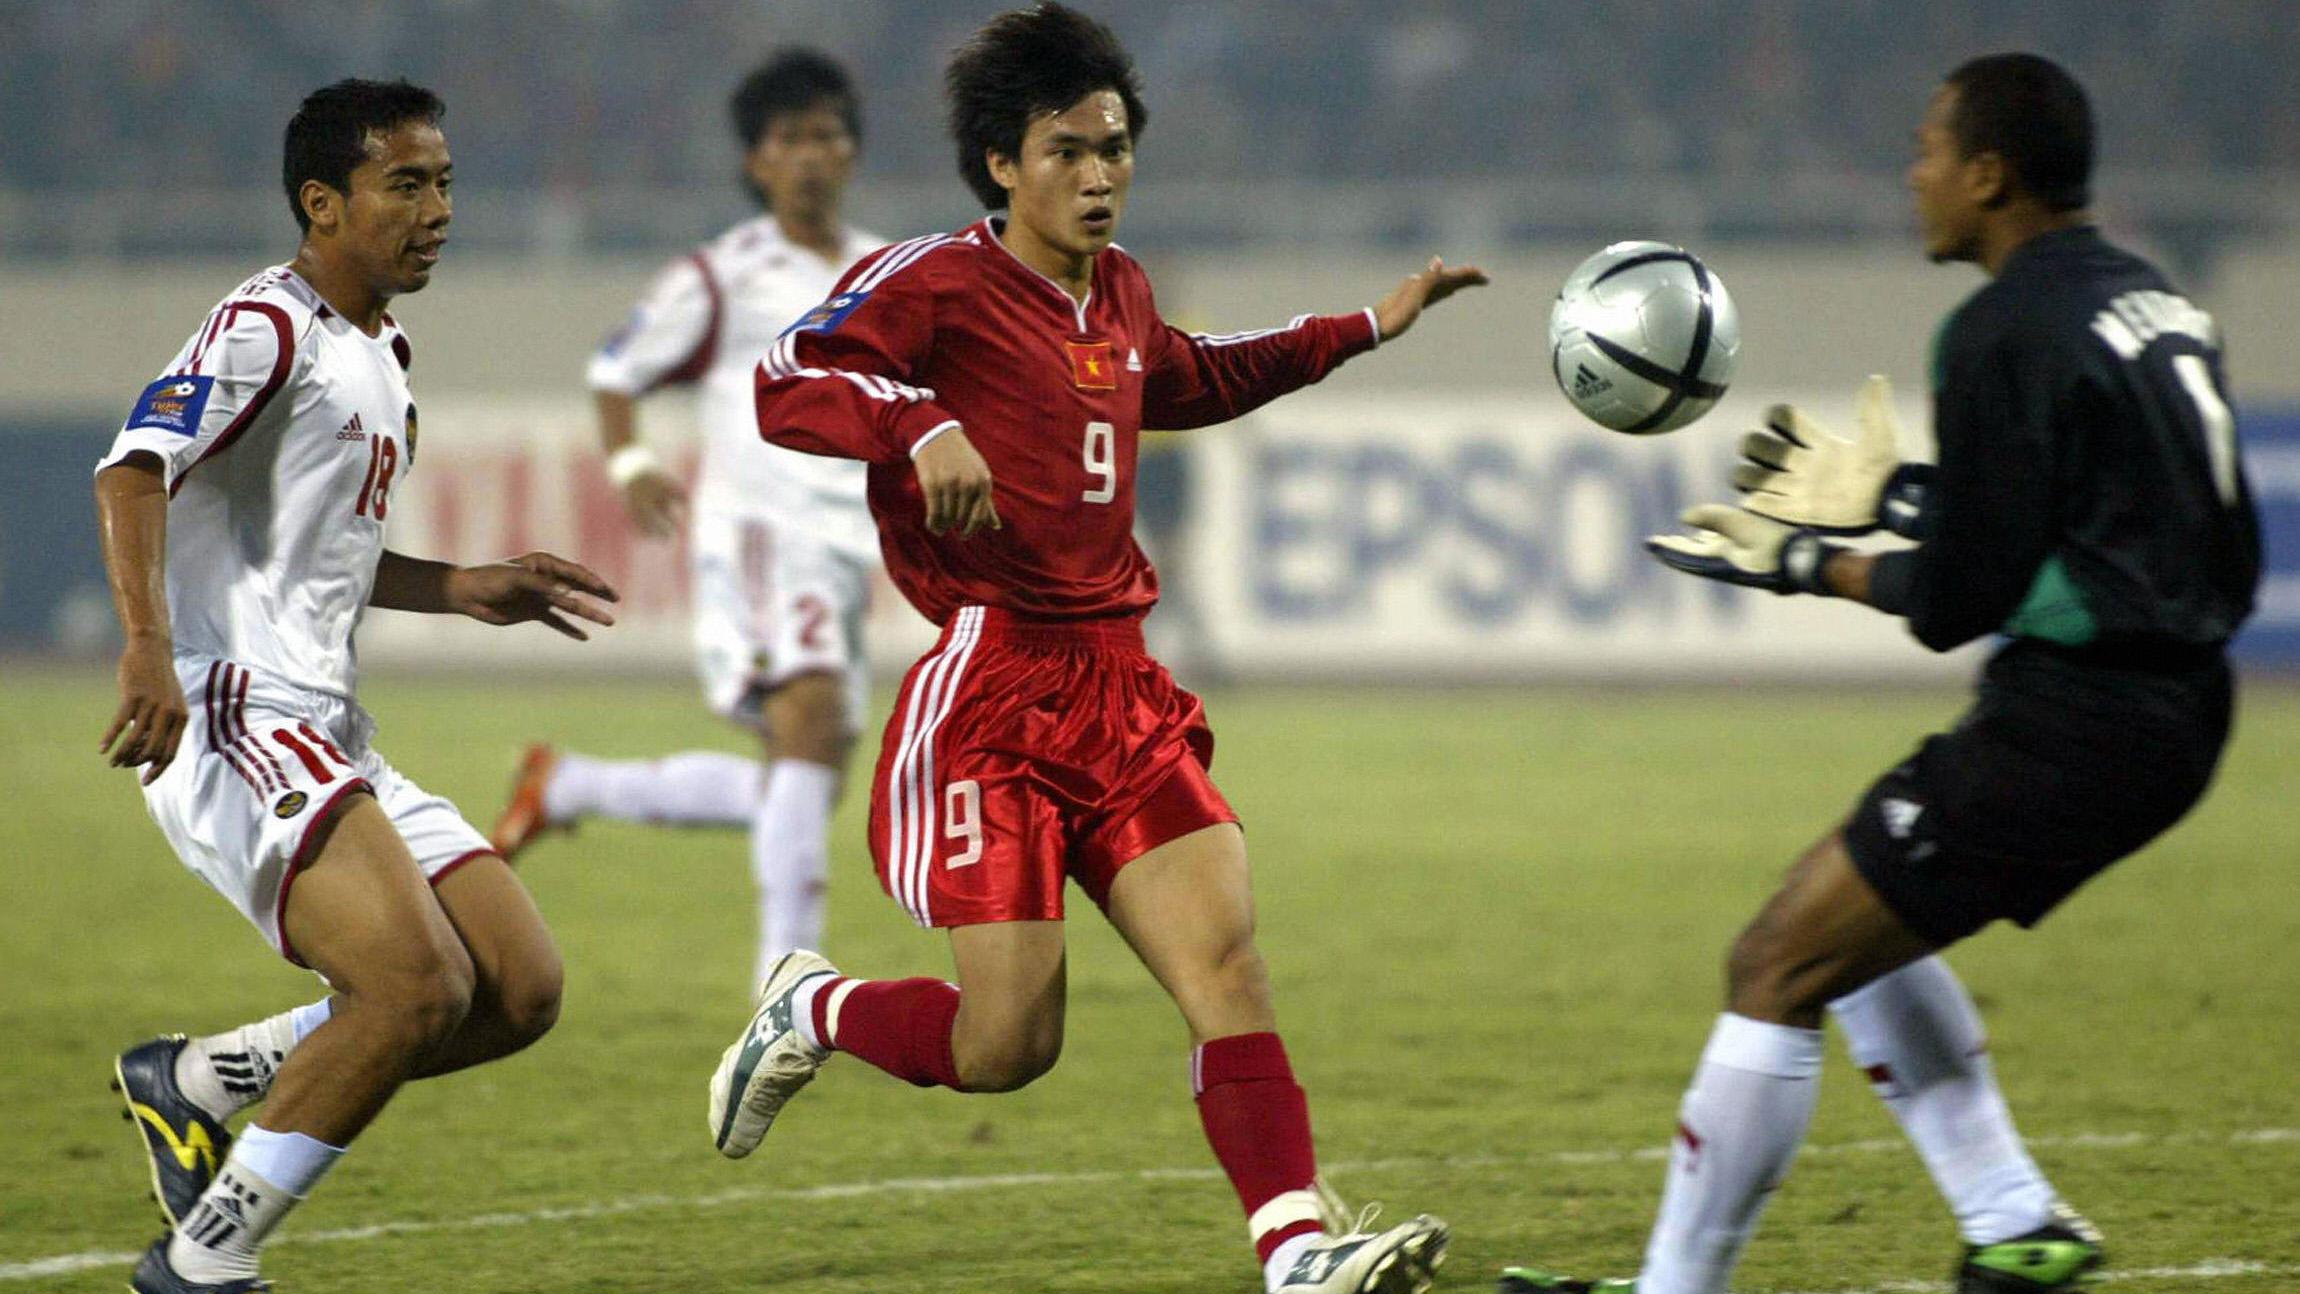 Le Cong Vinh - Vietnam & Hendro Kartiko - Indonesia Tiger Cup 2004